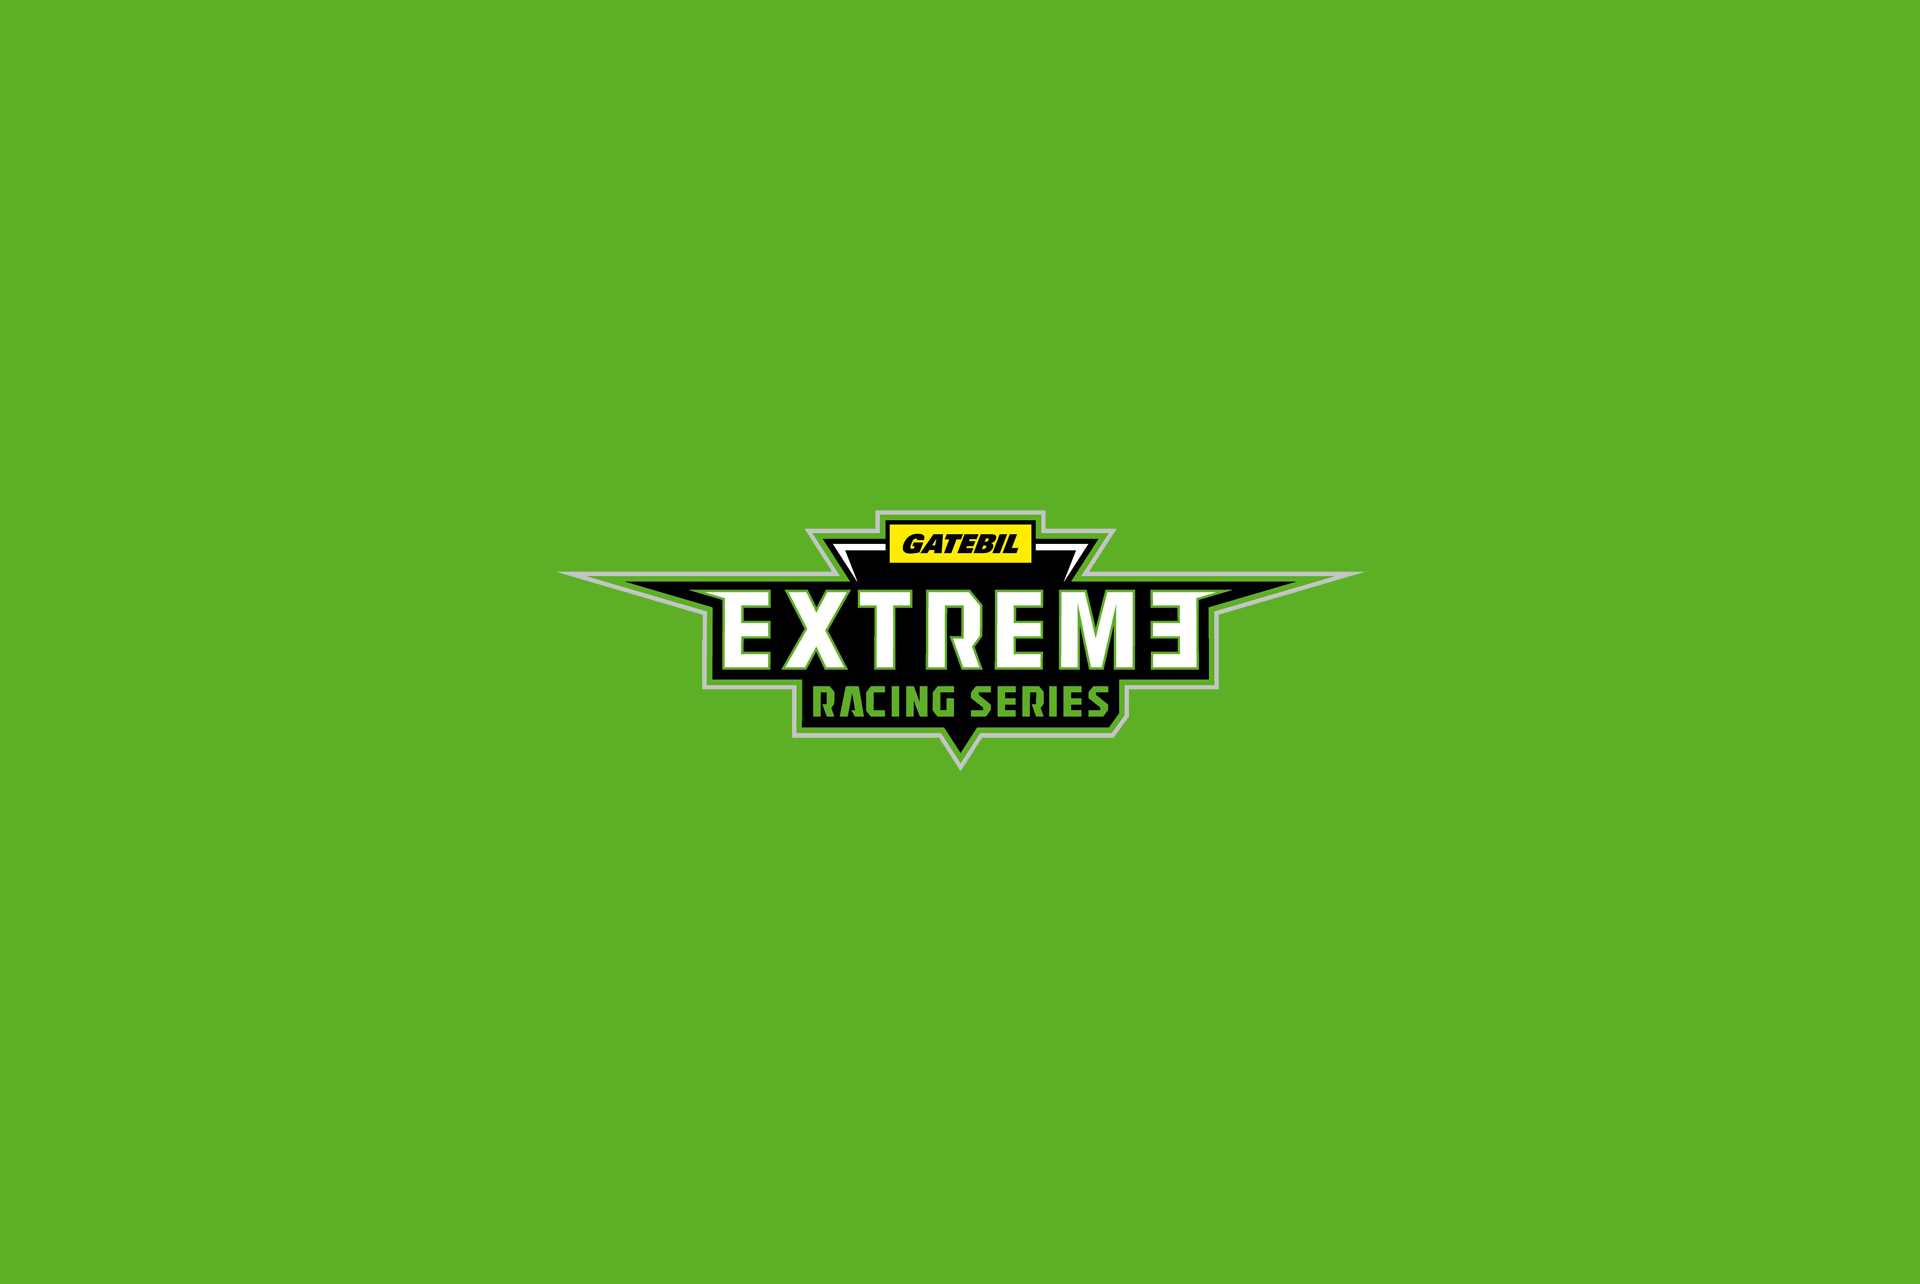 Logo Gatebil Extreme Racing Series